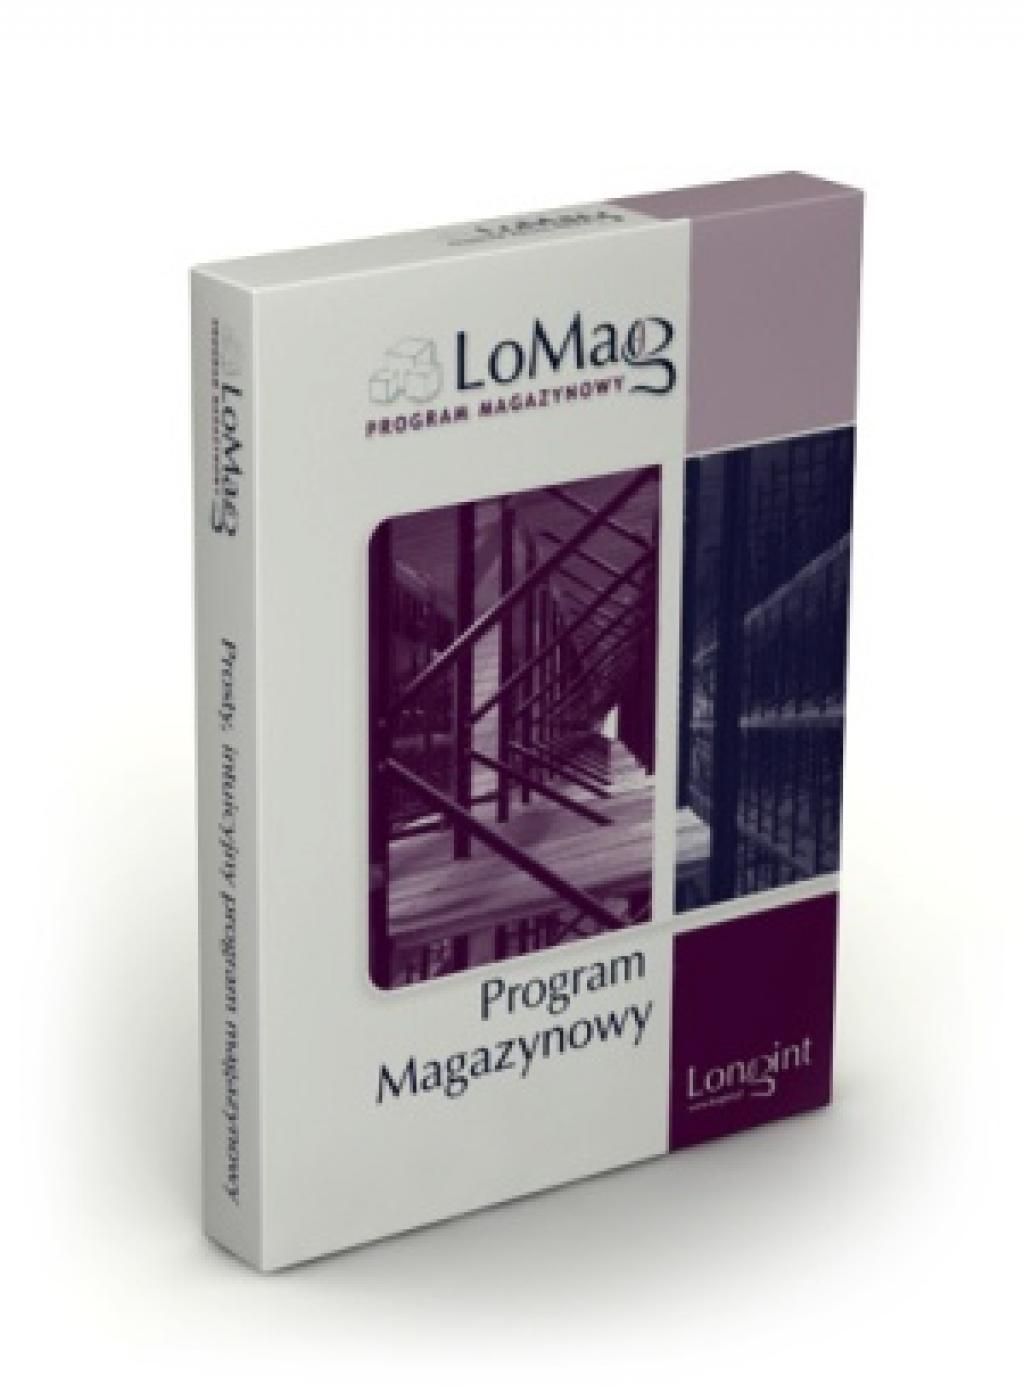 Program magazynowy LoMag